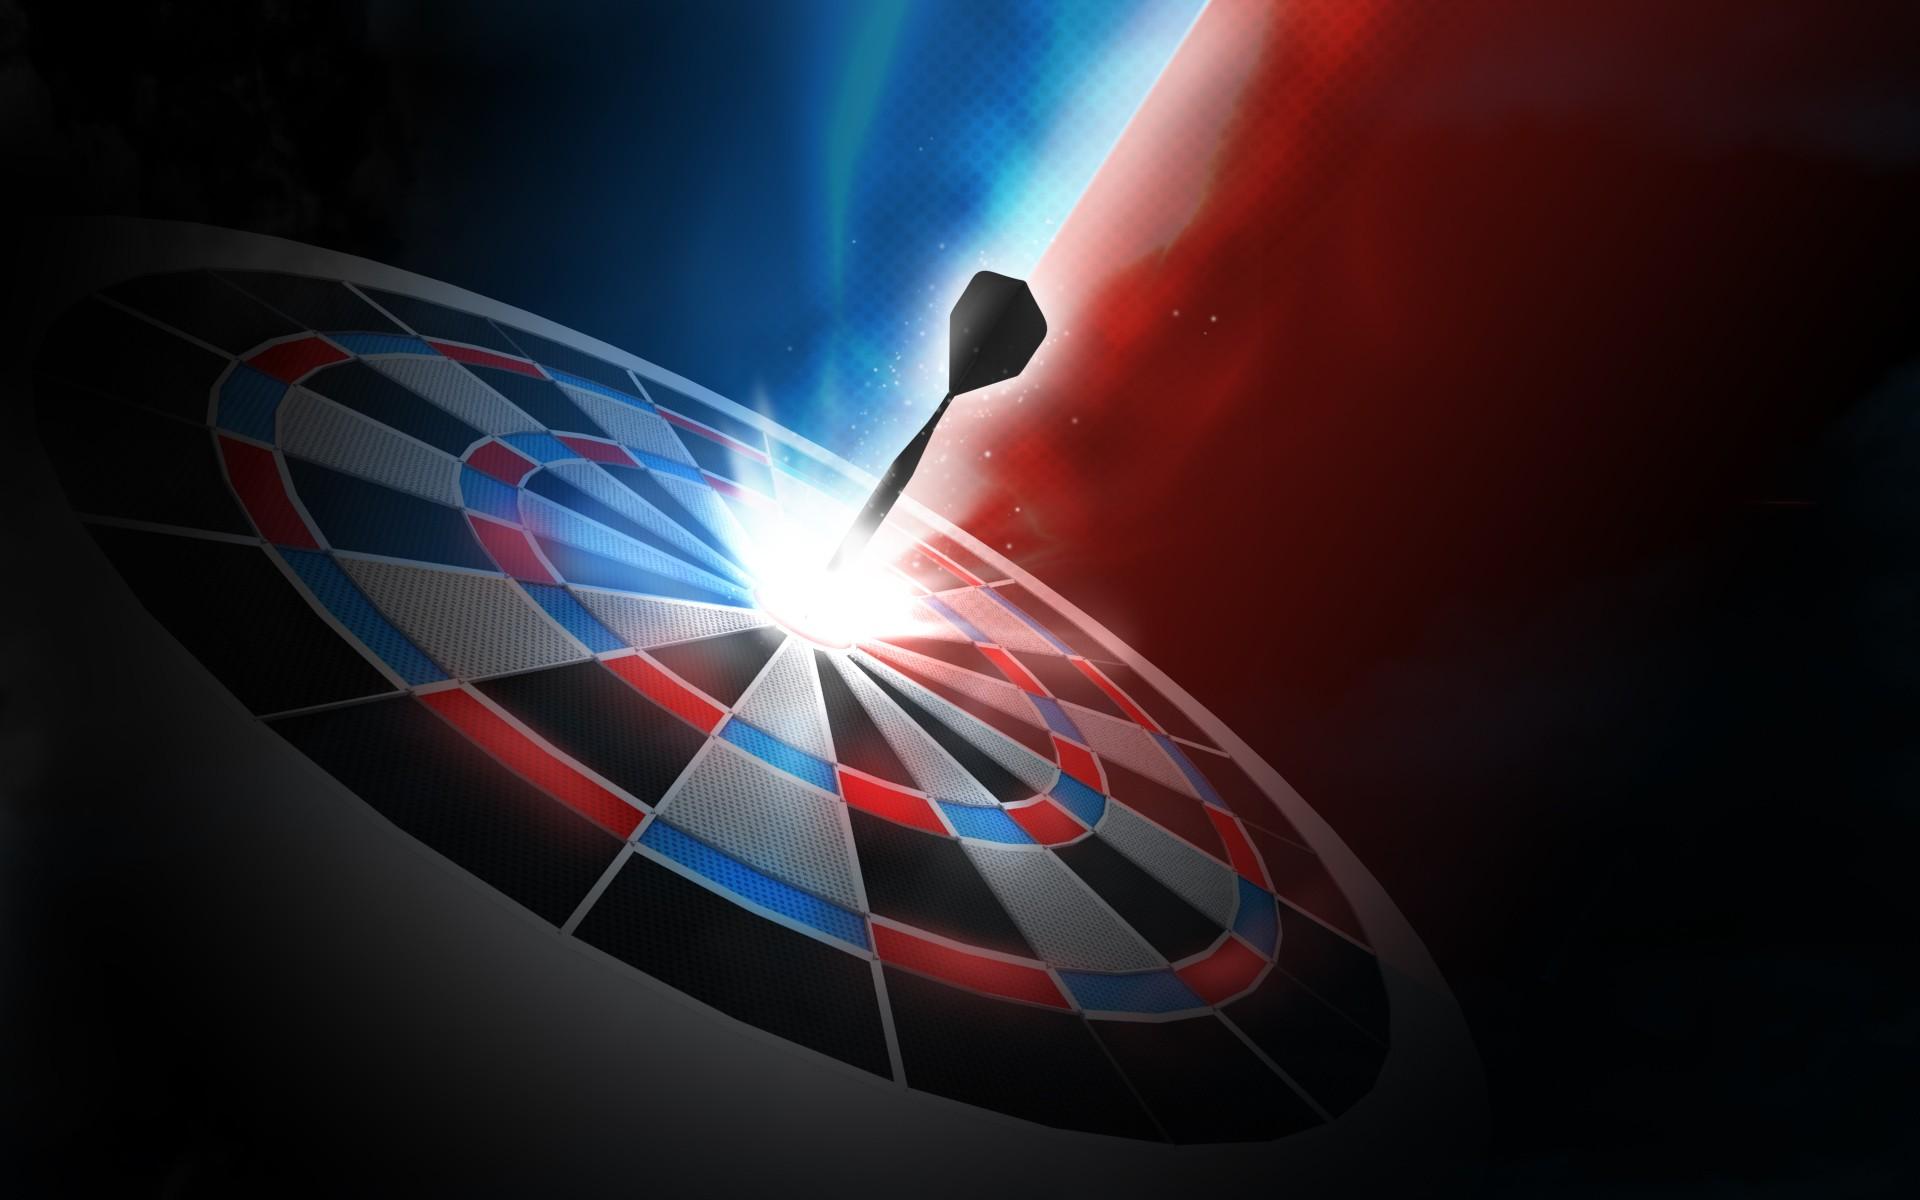 dart board hd wallpapers - photo #15